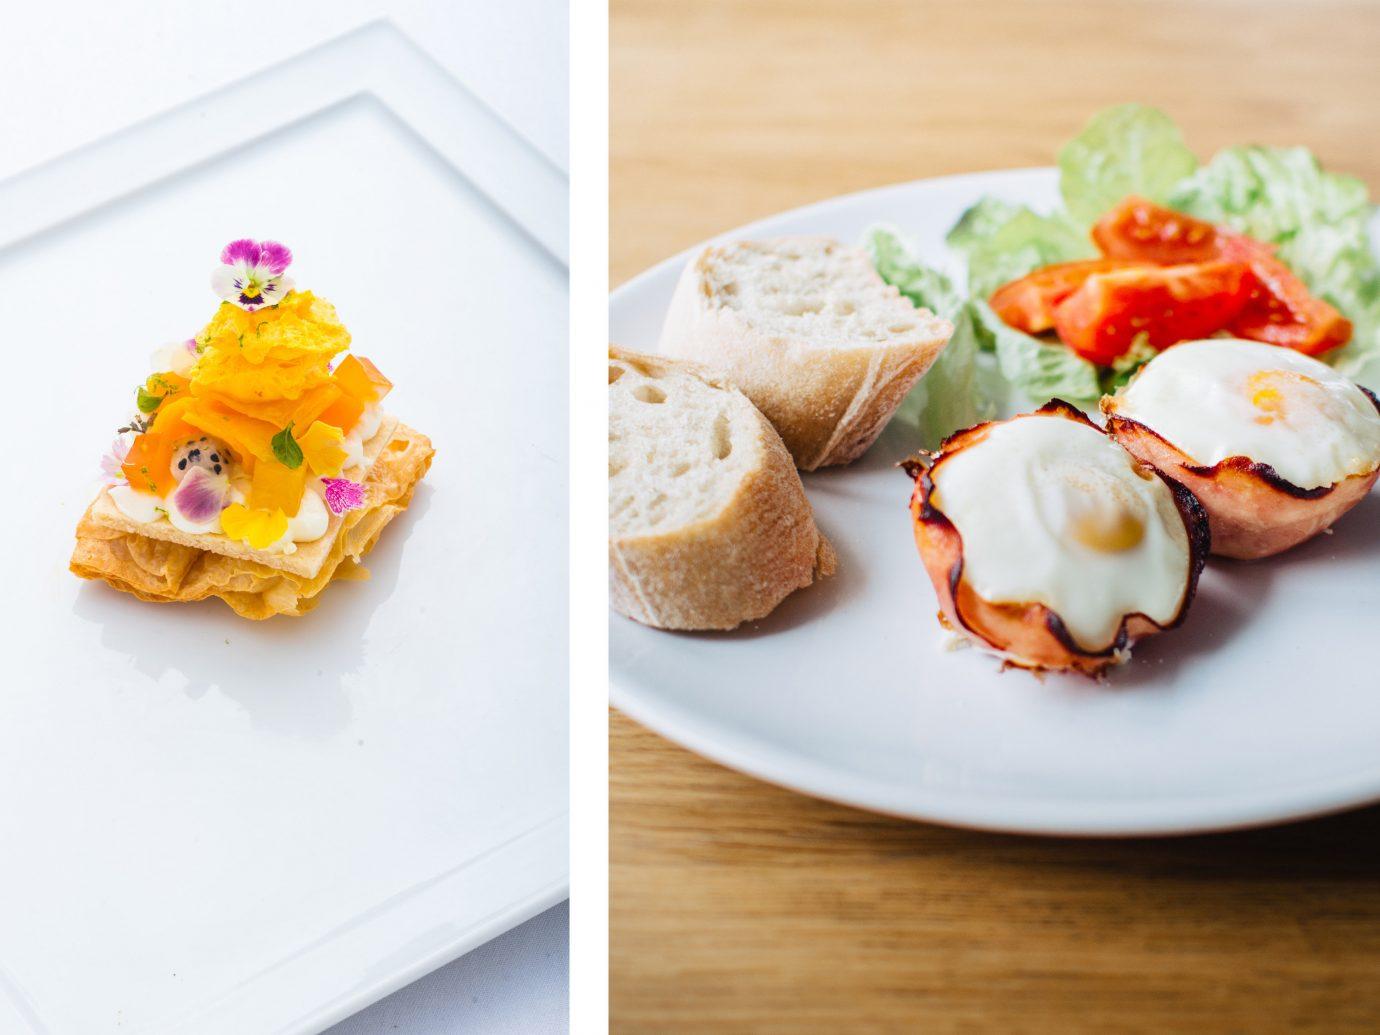 Trip Ideas food plate dish meal breakfast brunch slice produce cuisine lunch